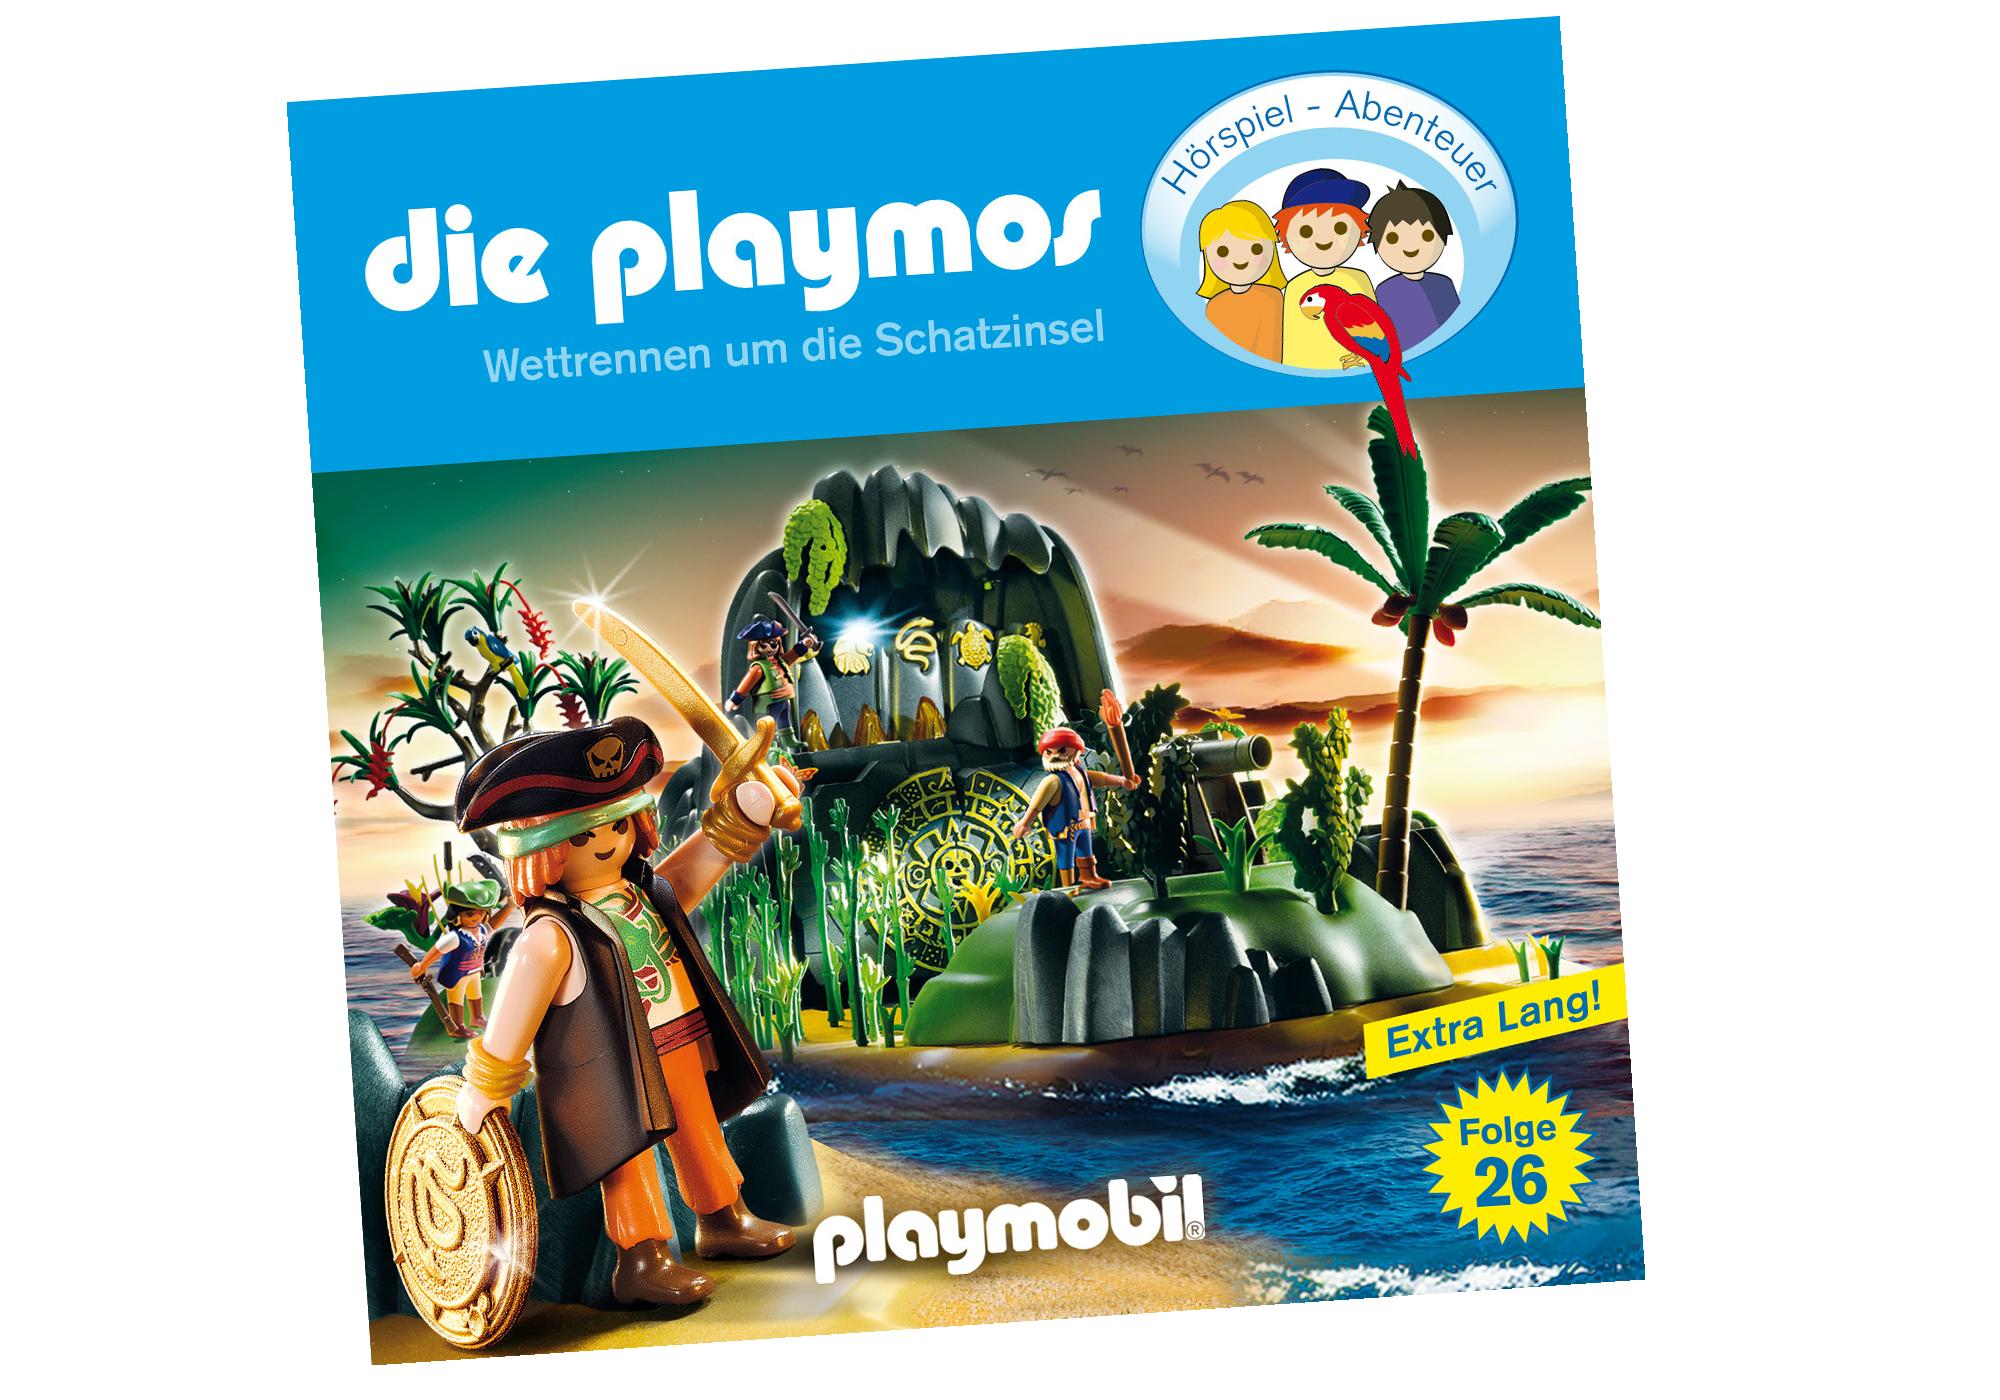 http://media.playmobil.com/i/playmobil/80332_product_detail/Wettrennen um die Schatzinsel (26) - CD